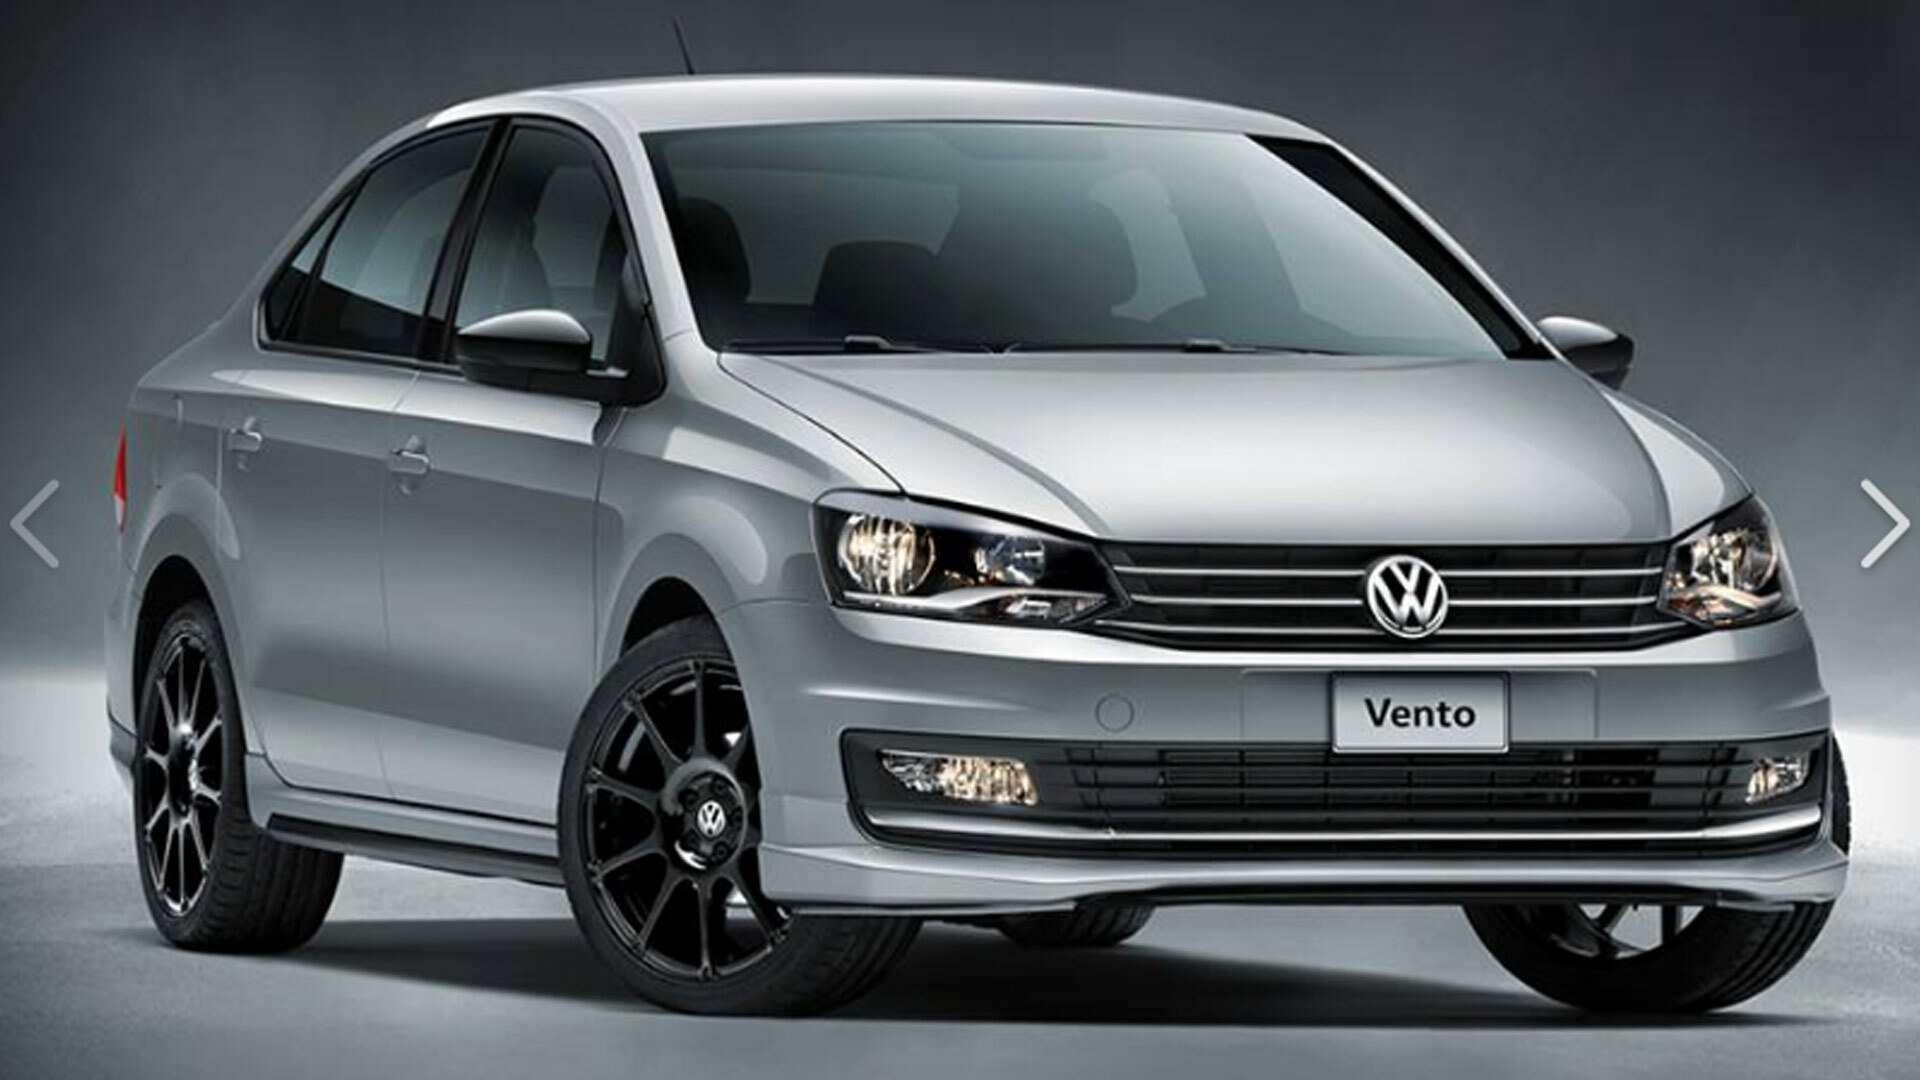 67 The Volkswagen Vento 2020 Picture with Volkswagen Vento 2020